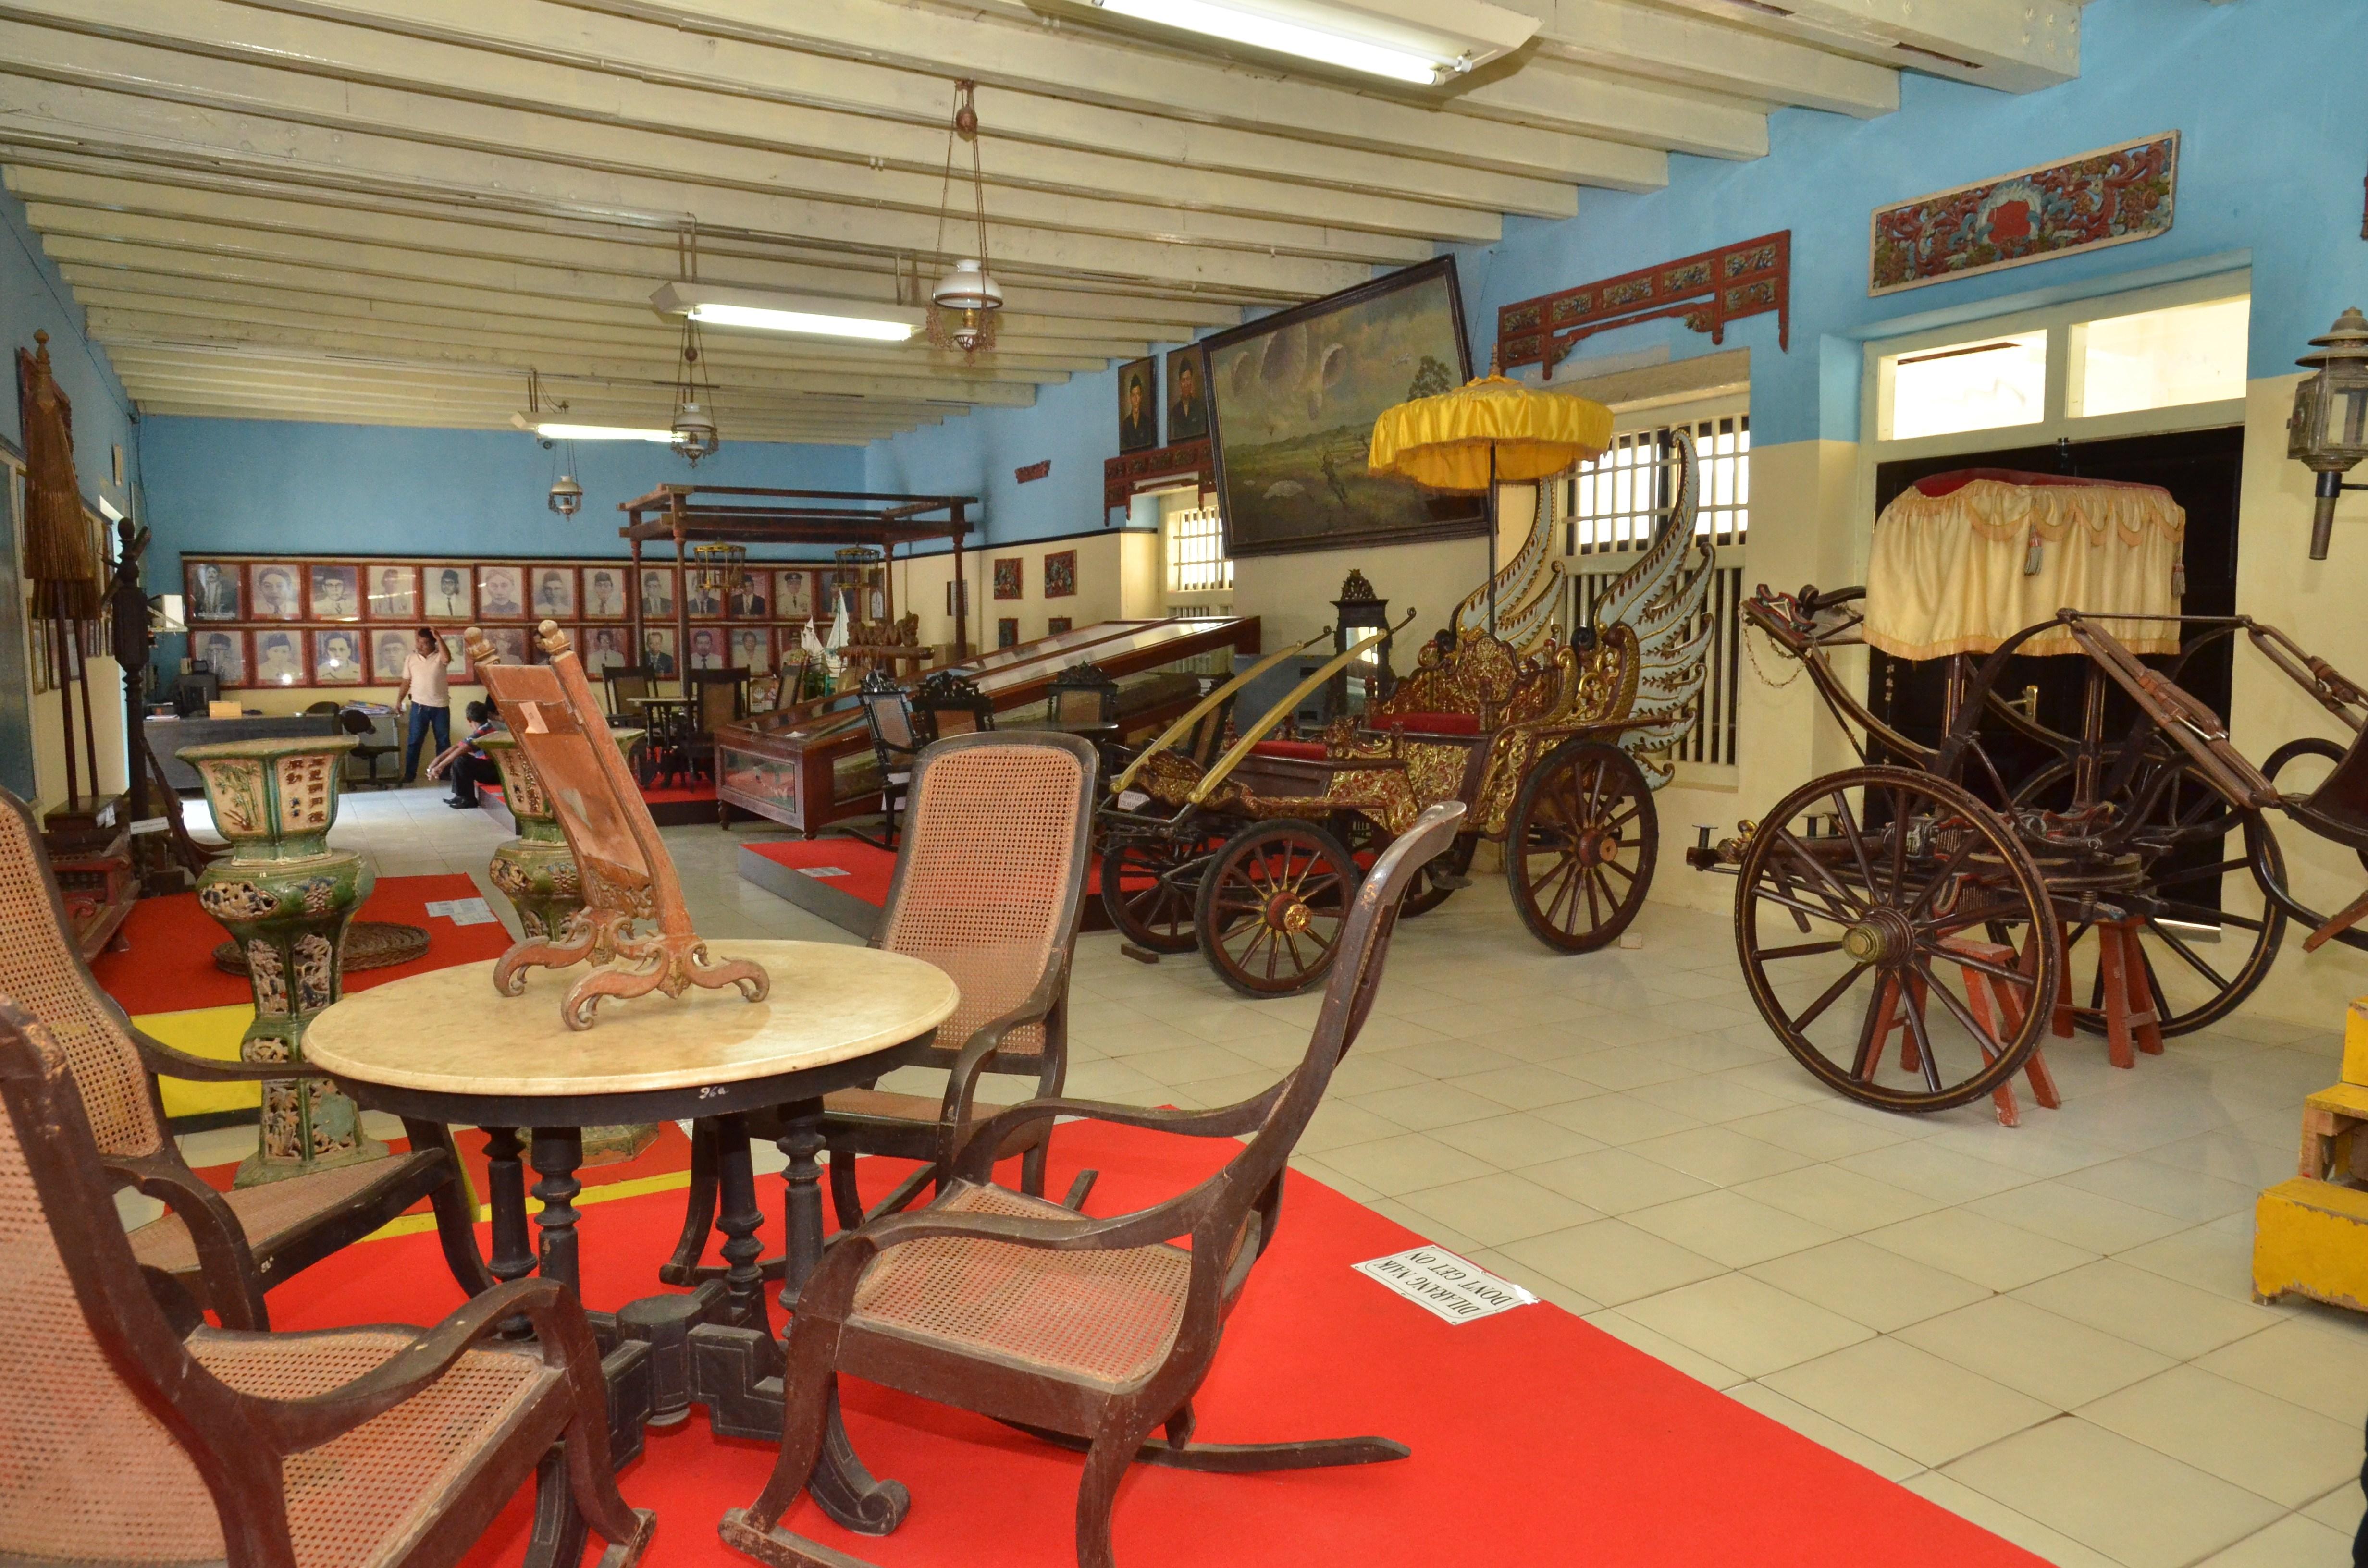 Wisata Sumenep Dwp Peninggalan Bersejarah Museum Tertata Rapi Keraton Kab